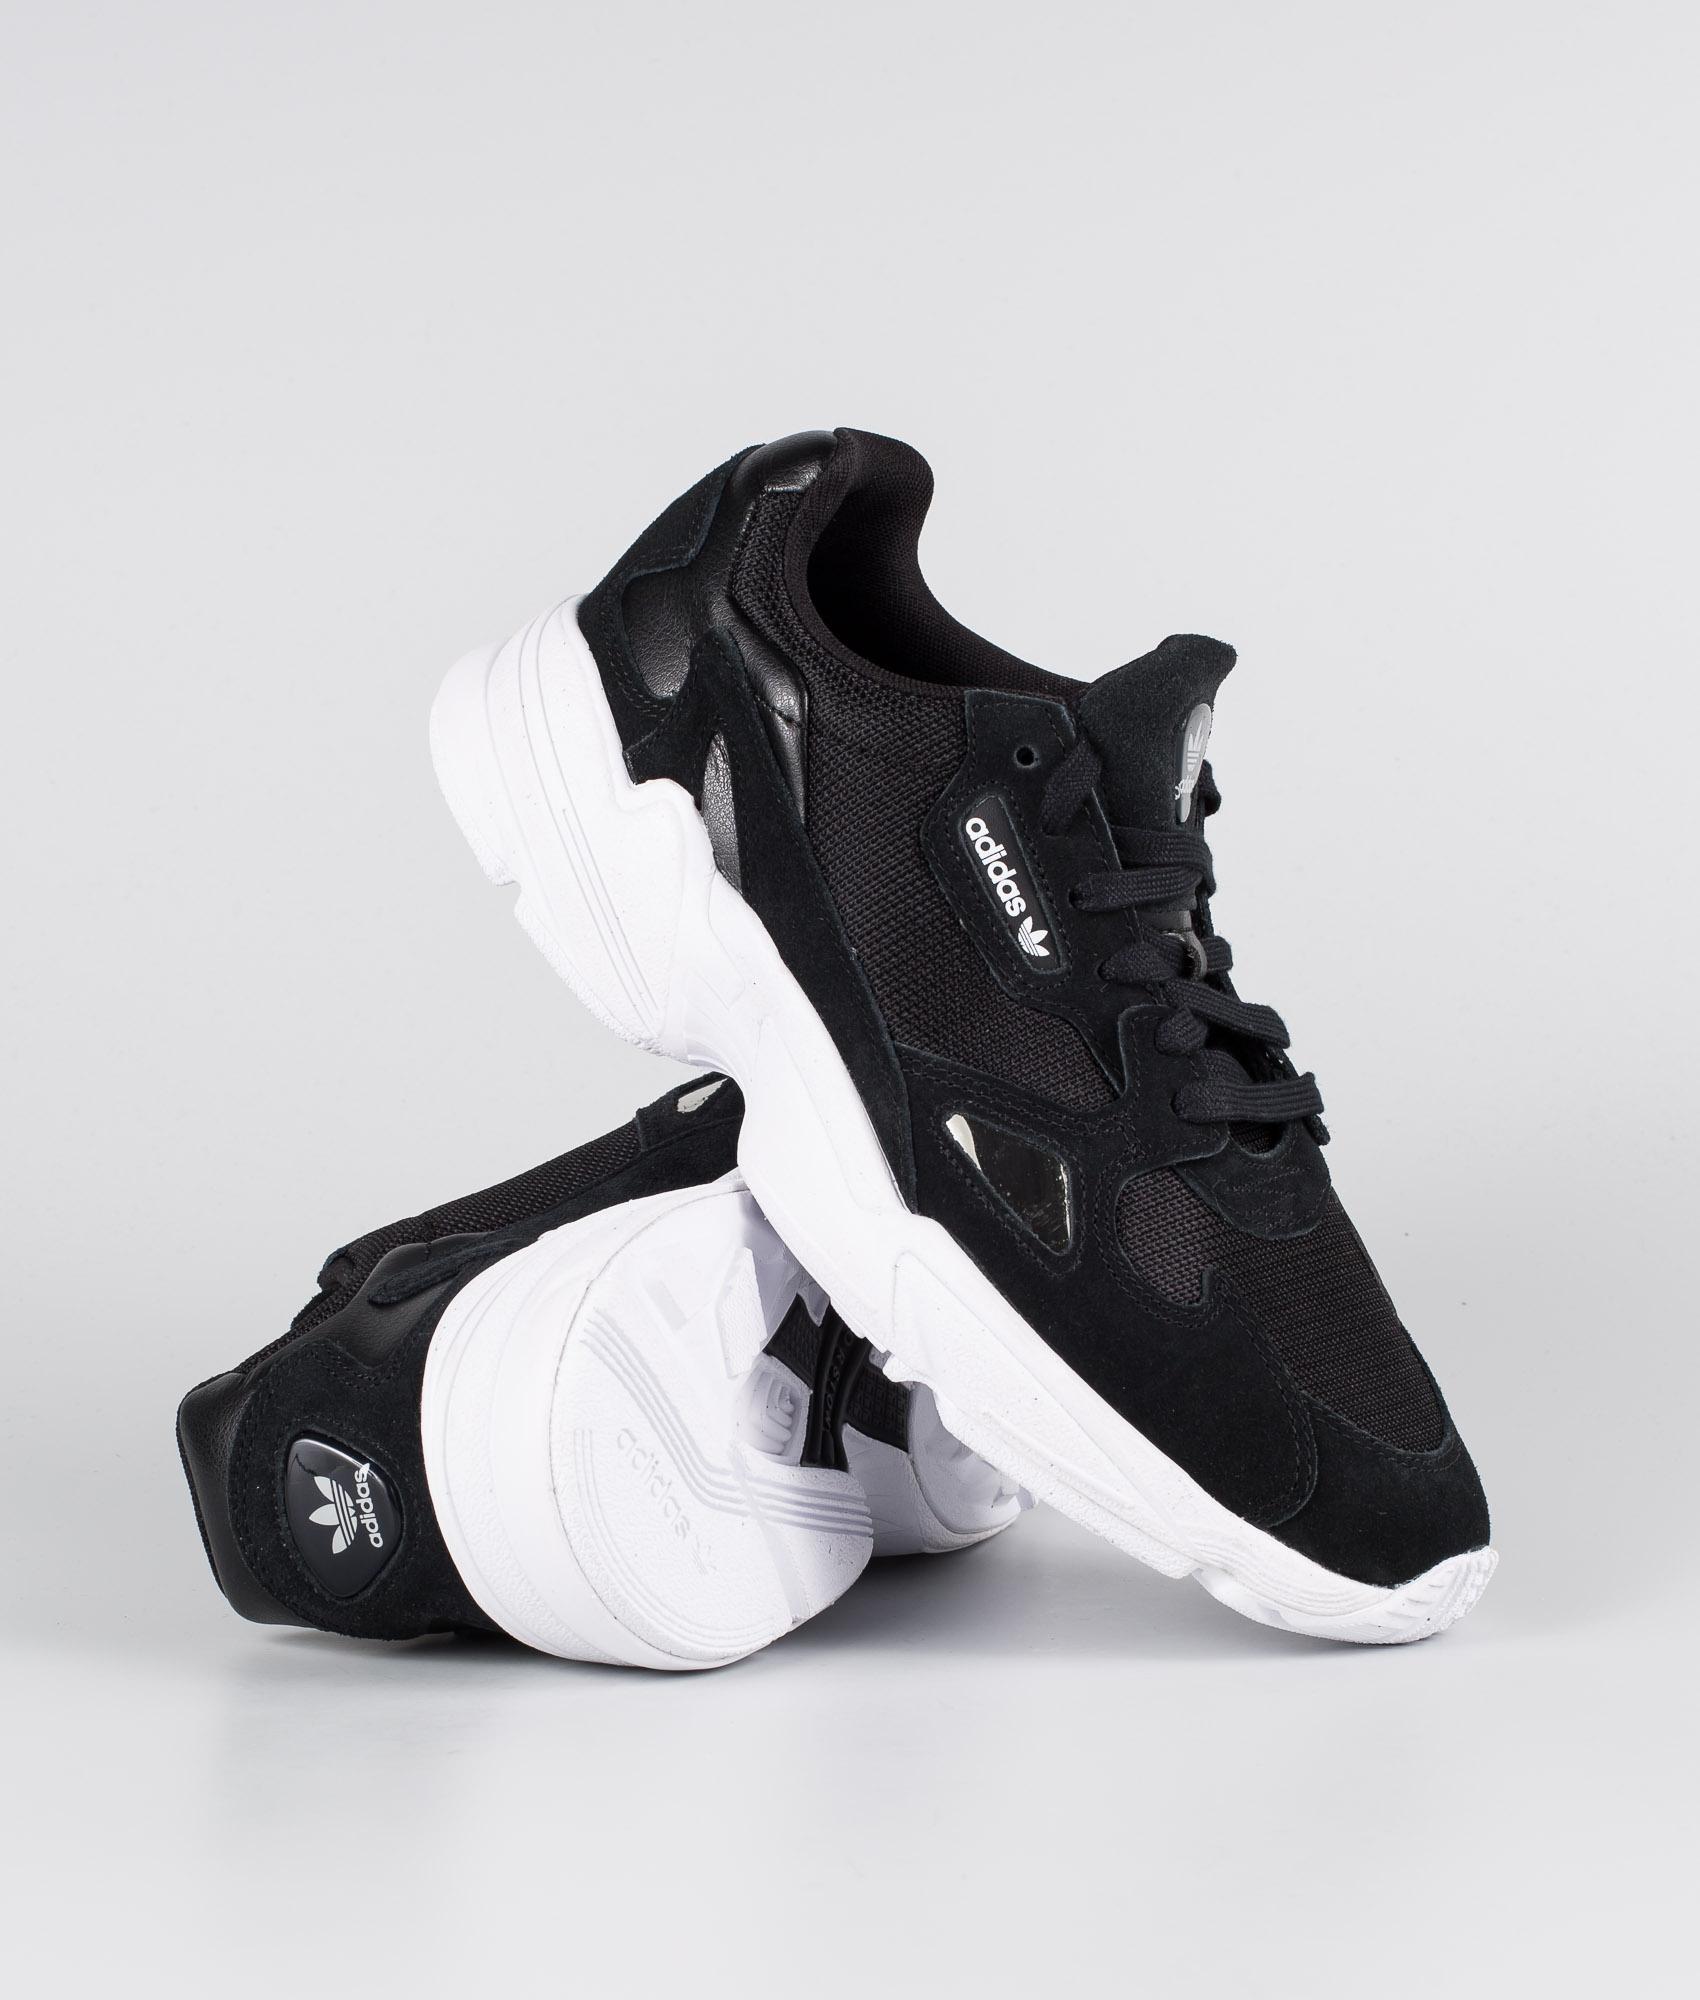 Adidas Originals Falcon Shoes Core